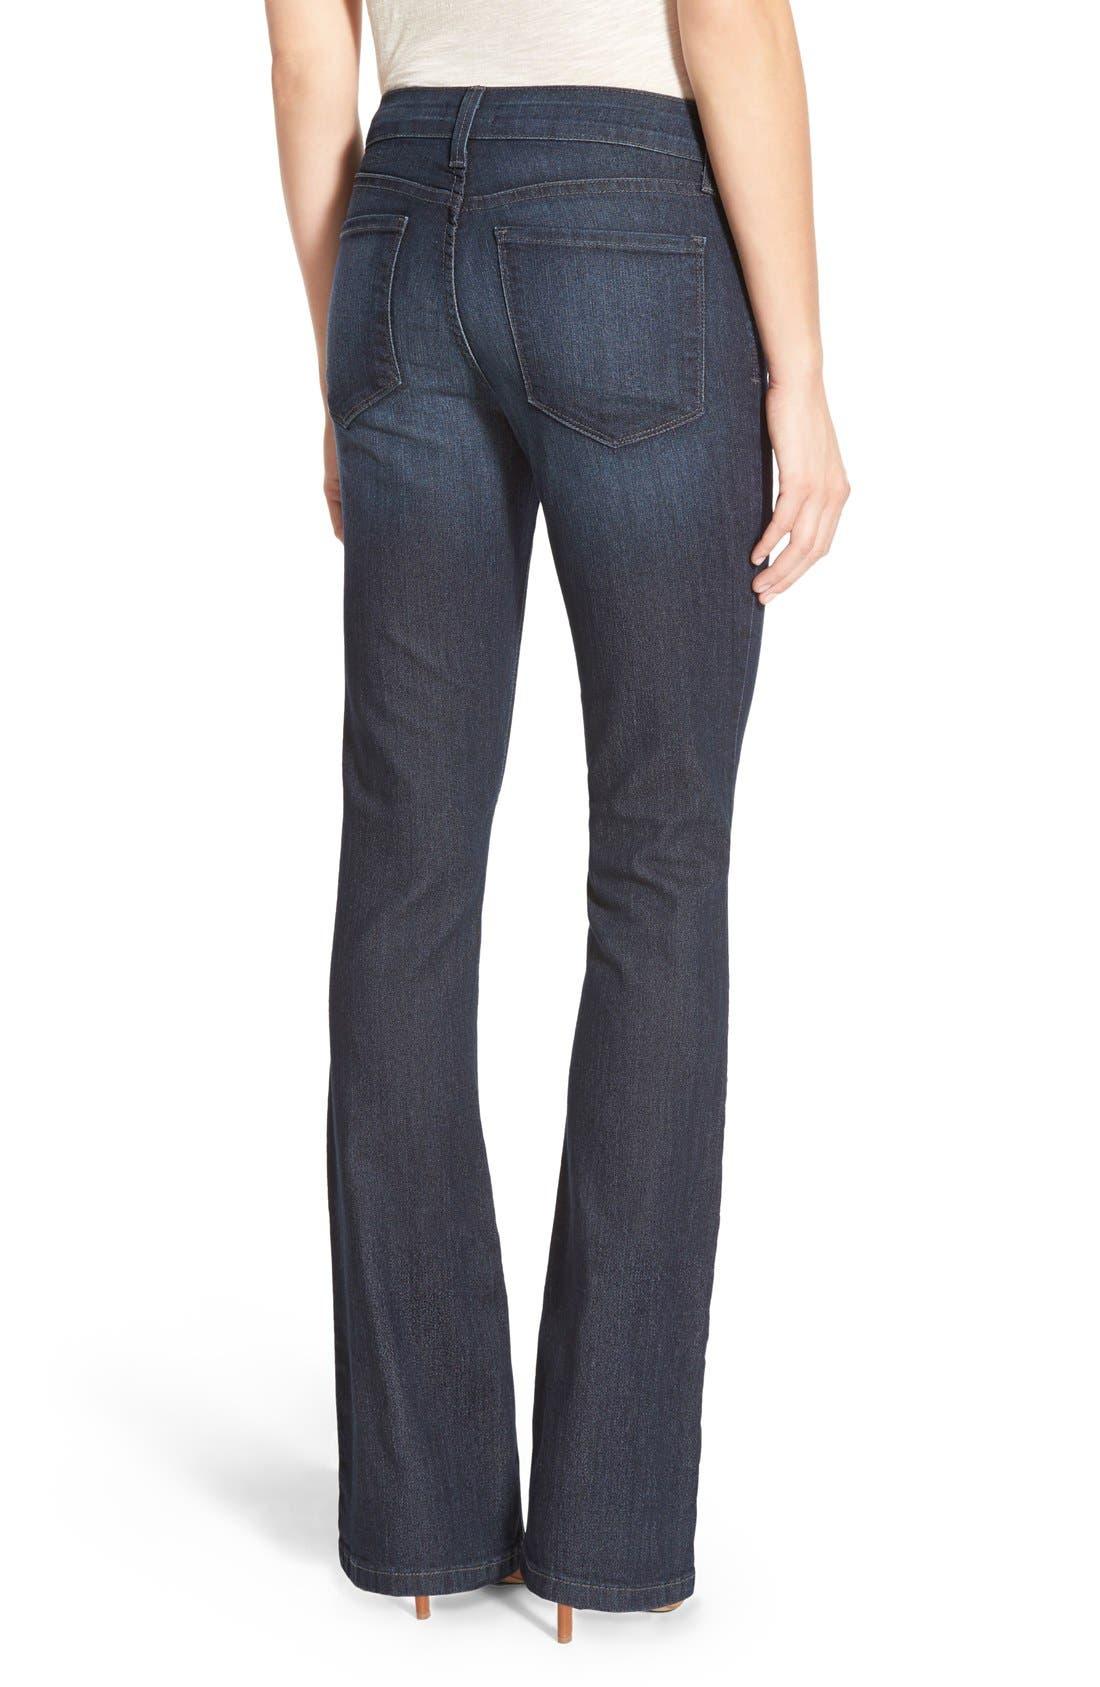 'Billie' Stretch Mini Bootcut Jeans,                             Alternate thumbnail 2, color,